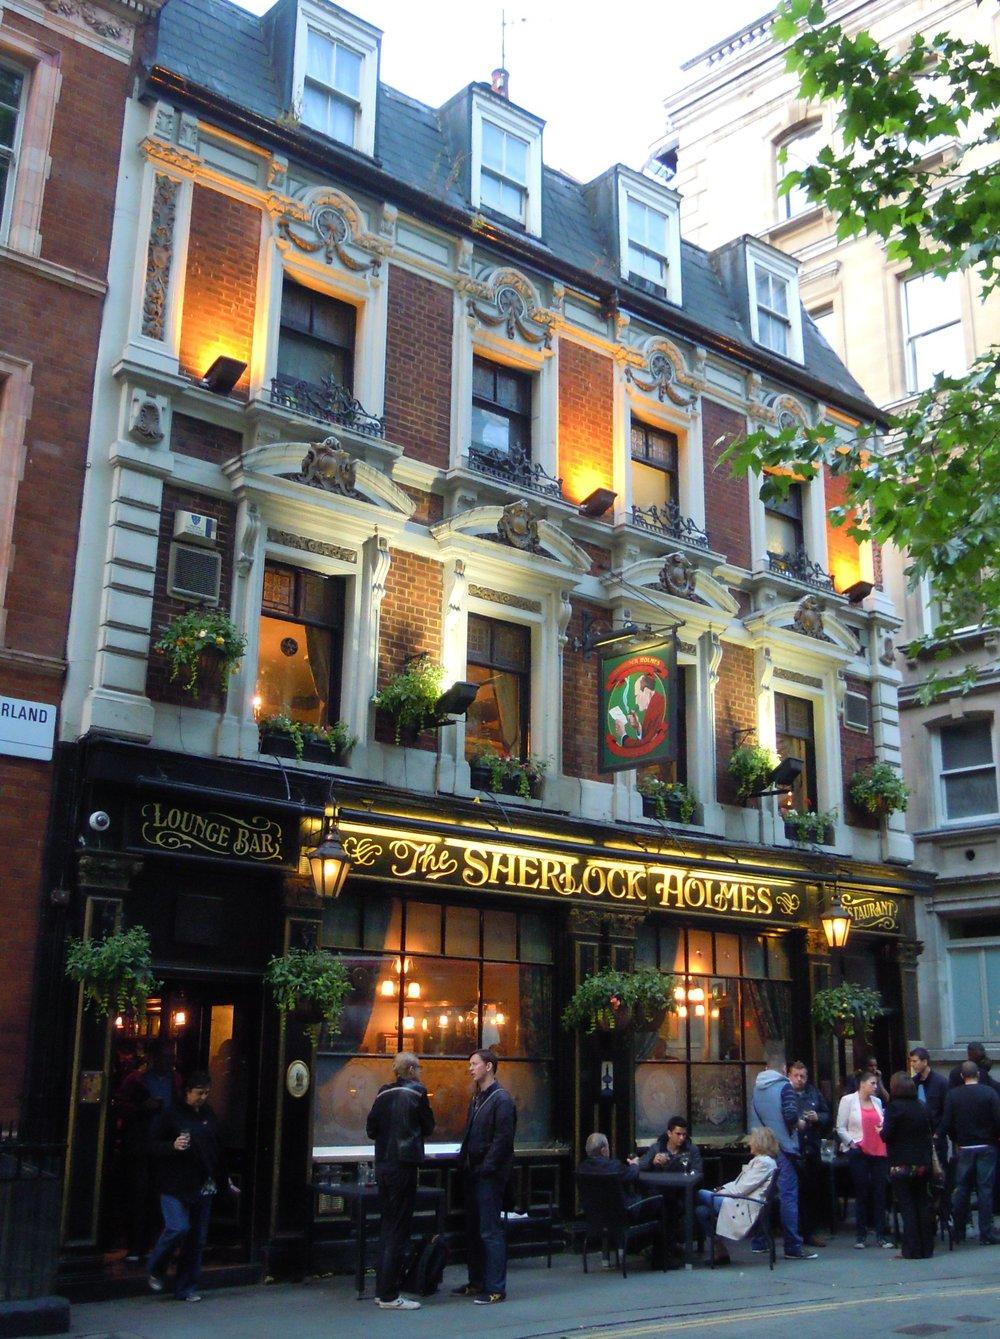 Sherlock Holmes pub exterior